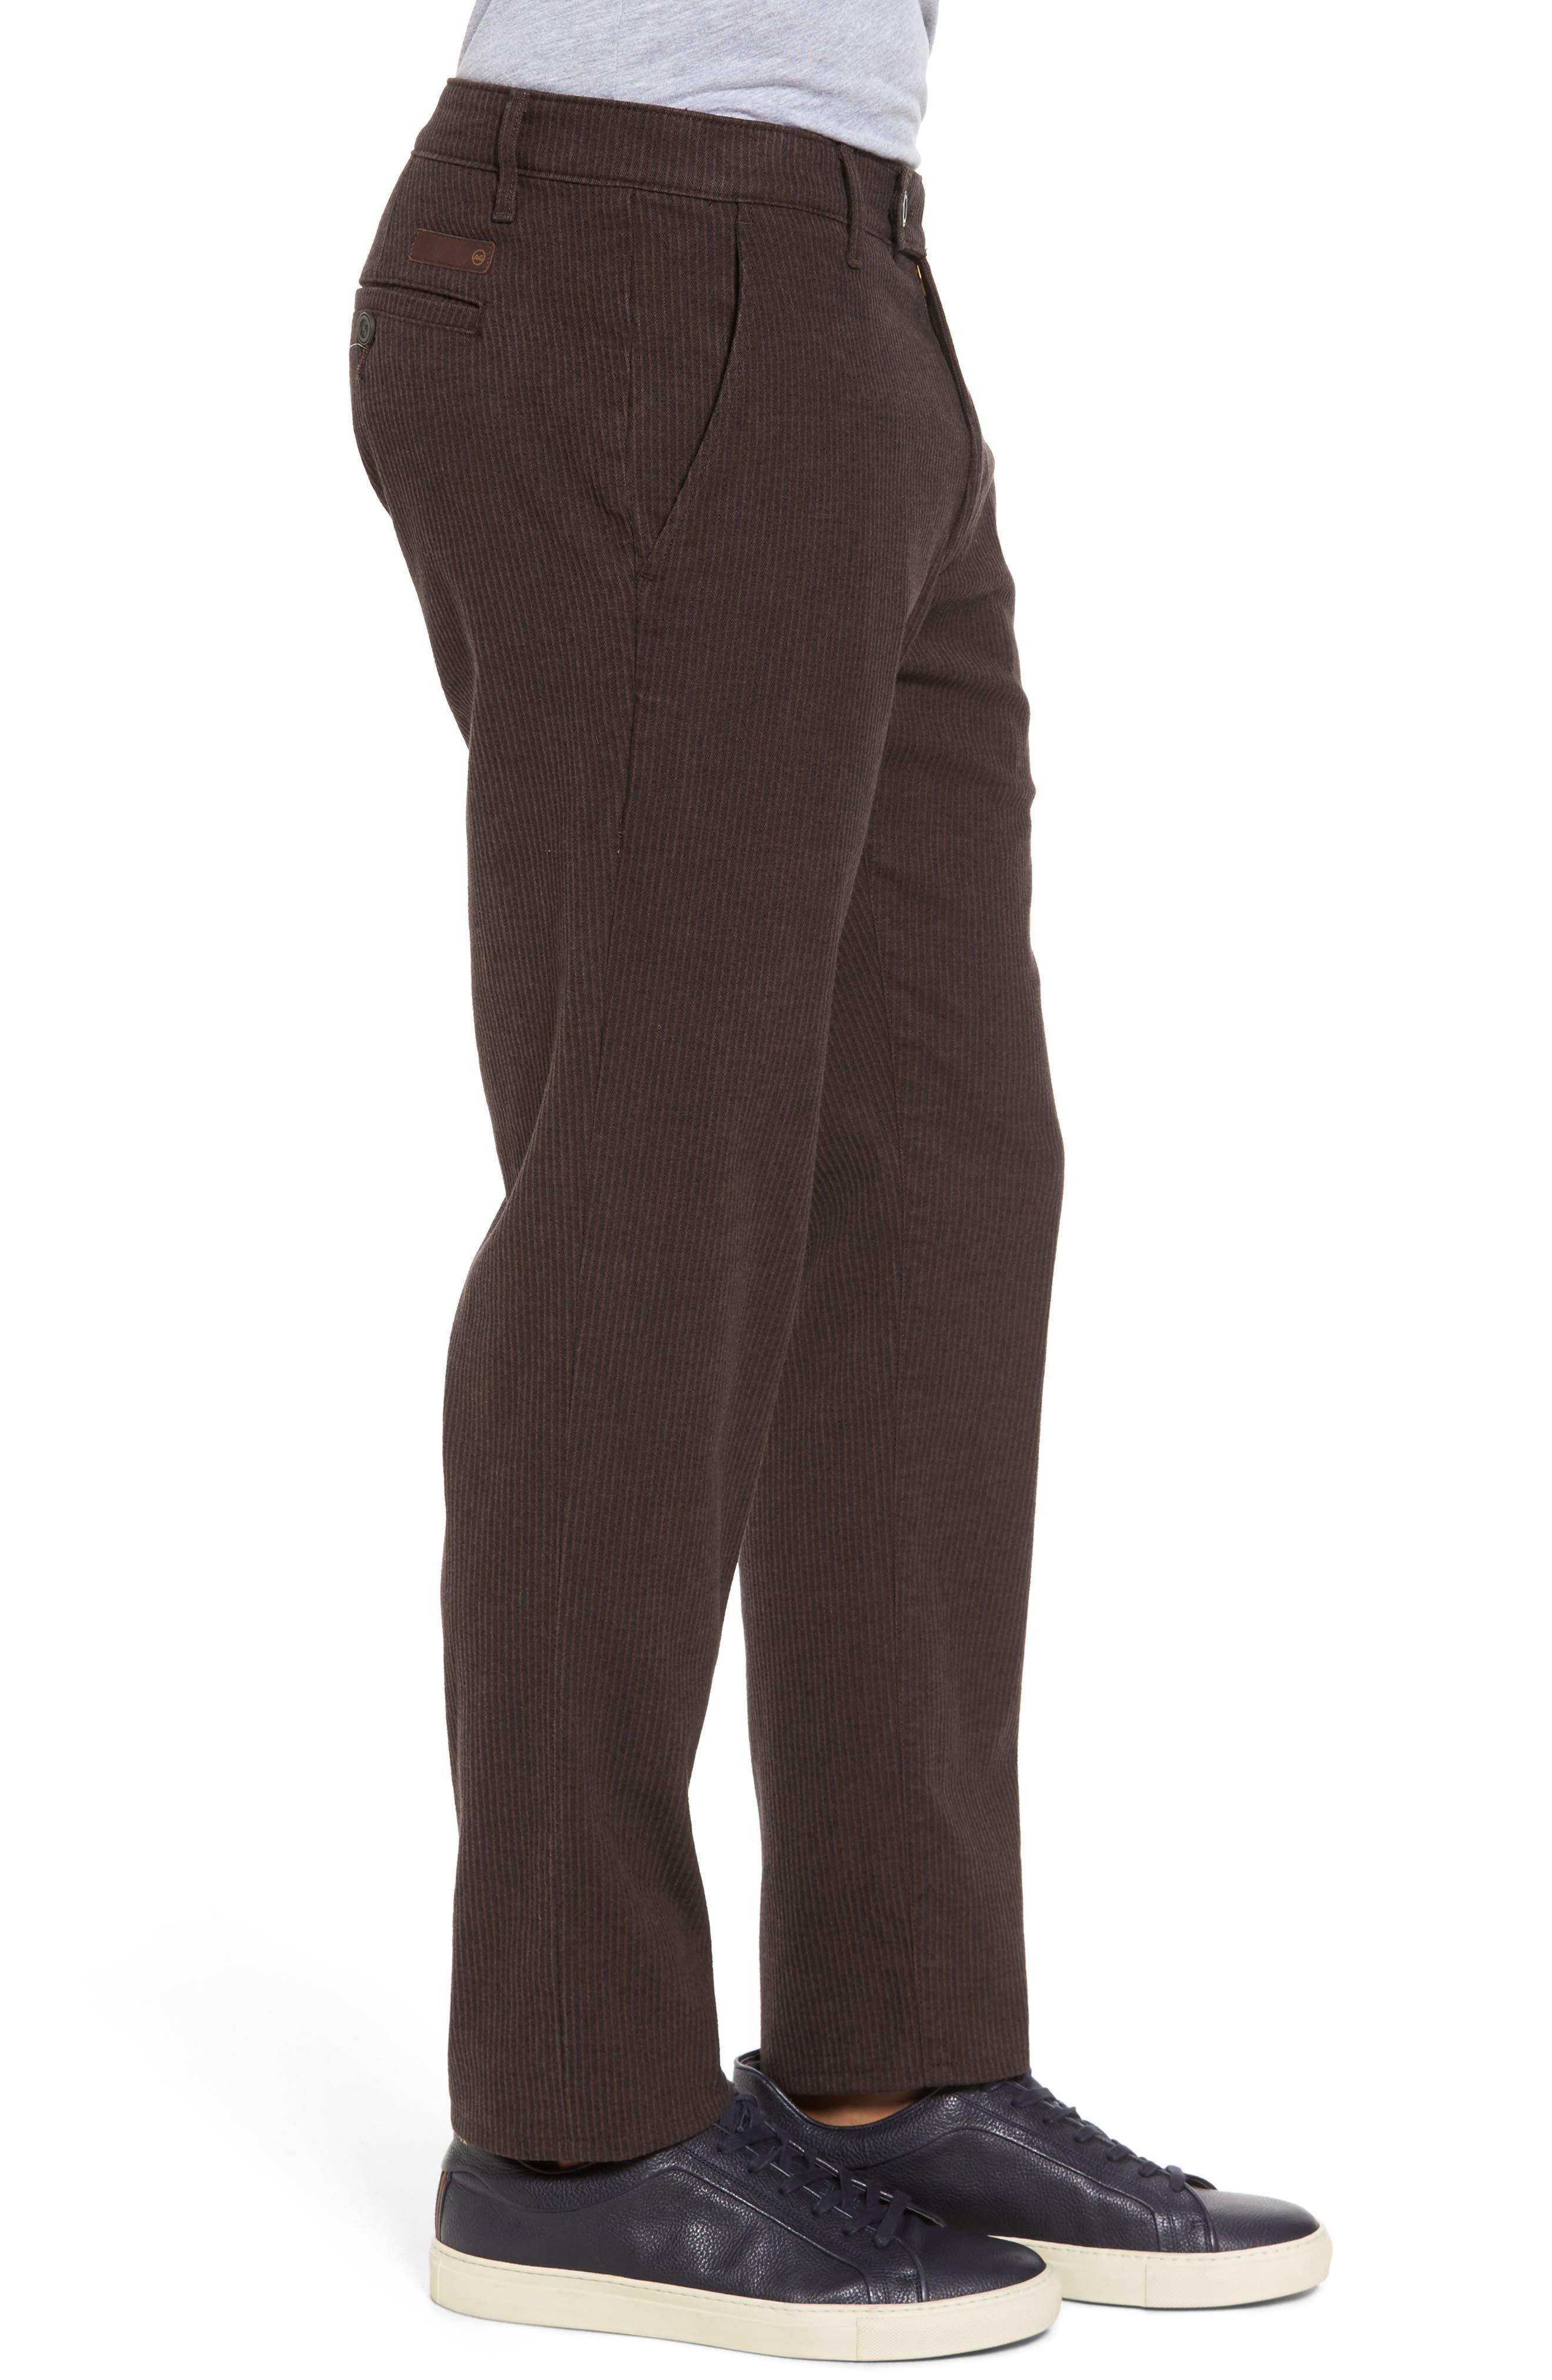 Marshall Slim Fit Pinstripe Pants,                             Alternate thumbnail 3, color,                             Dark Oakwood